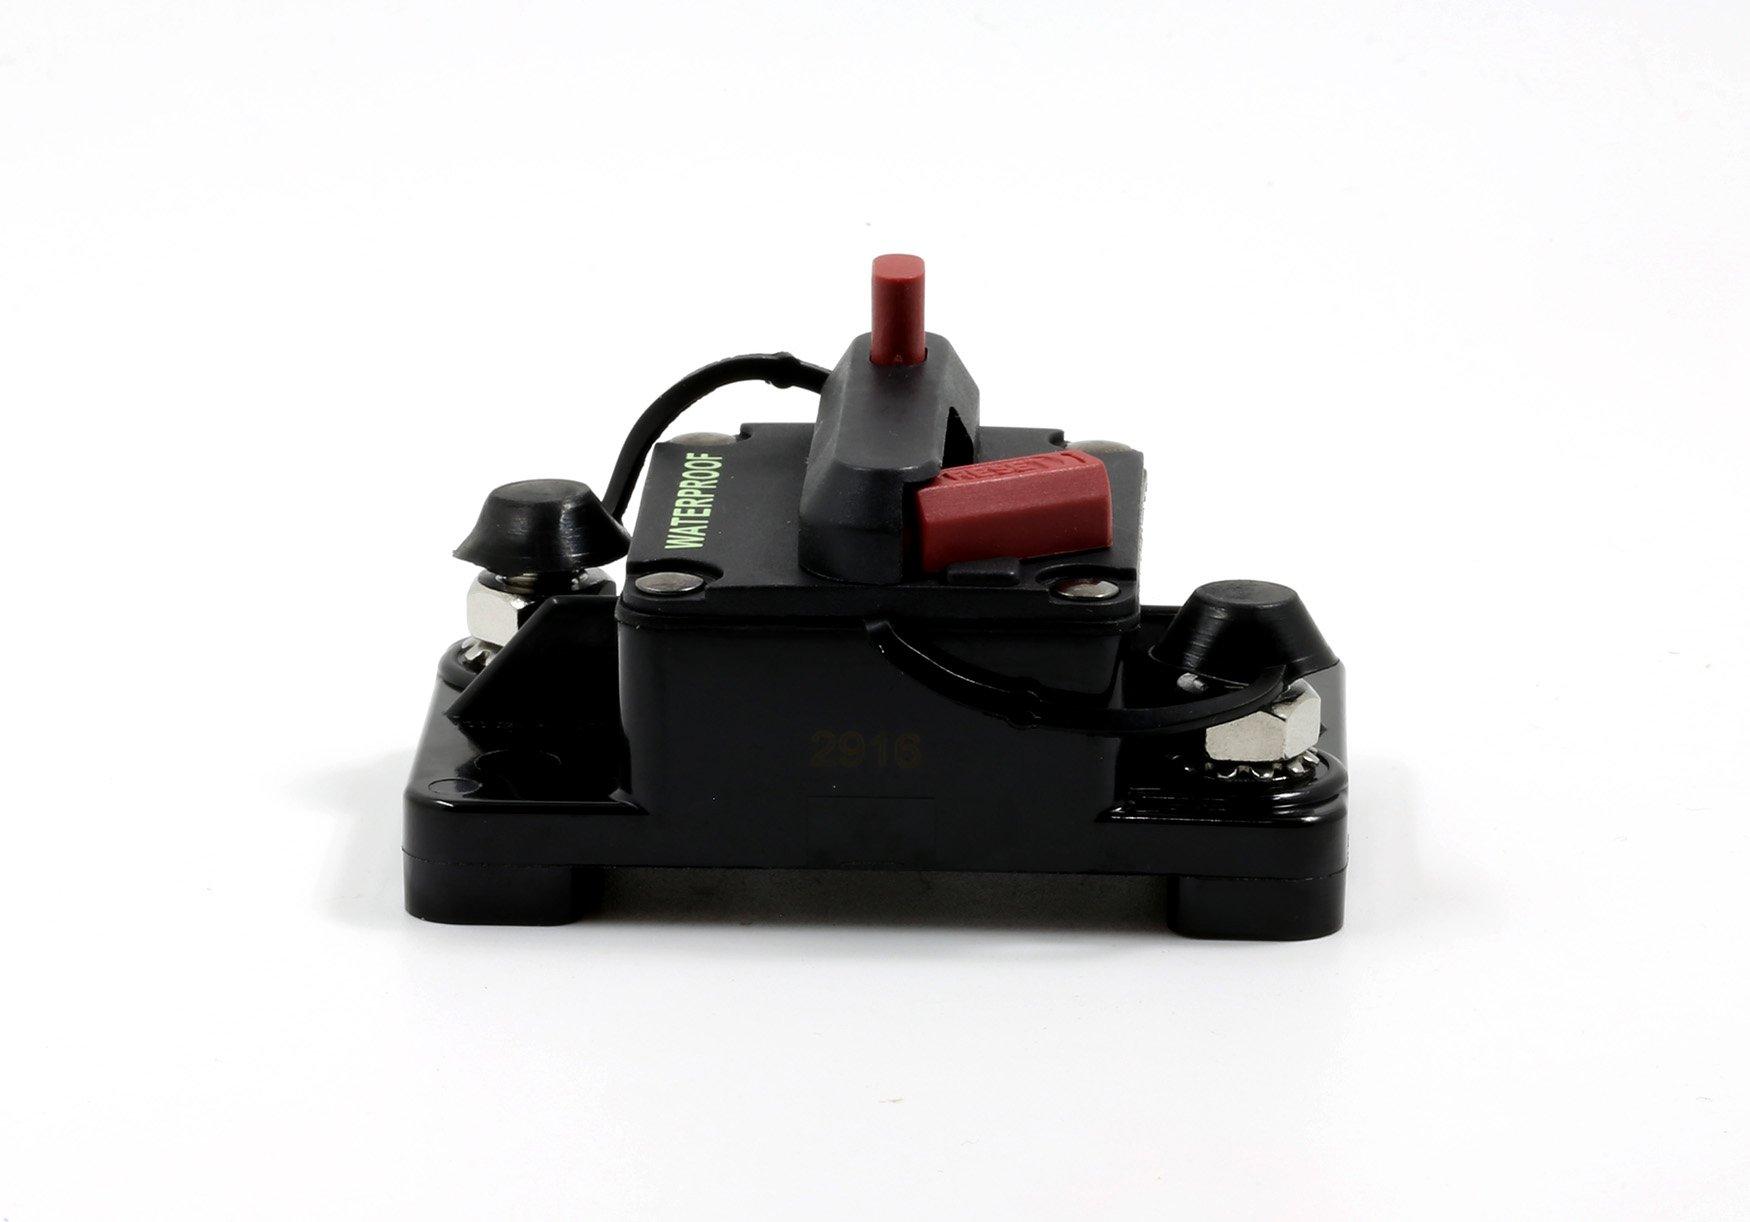 Lumision Waterproof Automotive Circuit Breaker Manual Reset upto 48VDC 70AMP by Lumision (Image #7)